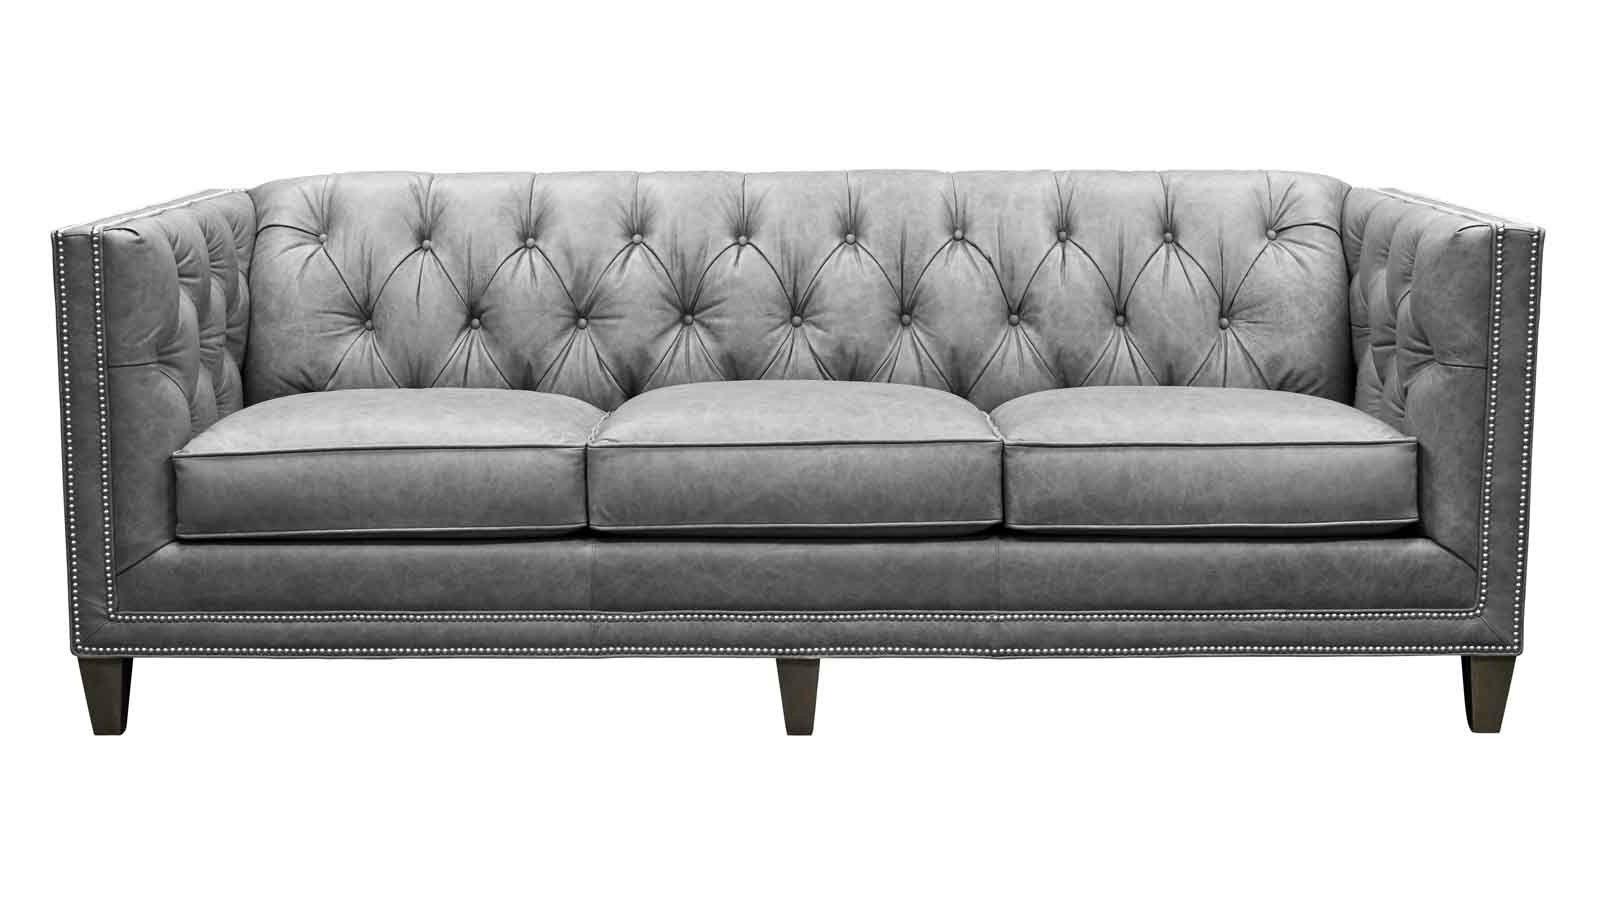 Favorite Taren Reversible Sofa/chaise Sleeper Sectionals With Storage Ottoman Within Elegant Macys Sofa Sleeper Concept – Modern Sofa Design Ideas (Gallery 7 of 20)